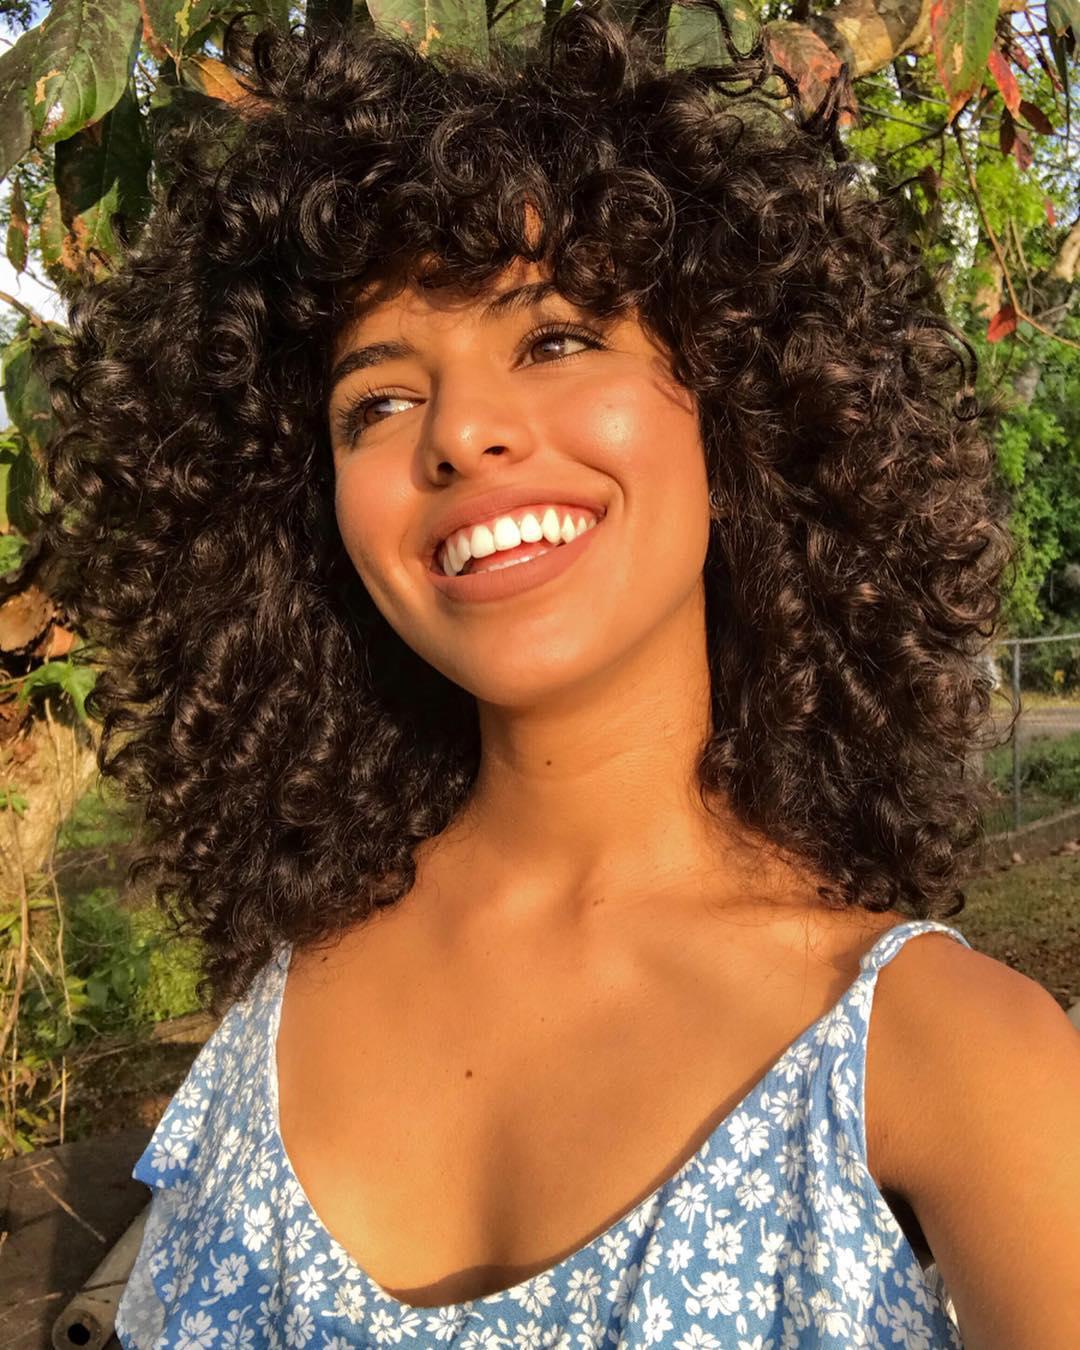 yuanilie alvarado, segunda finalista de reyna hispanoamericana 2019. 36086011